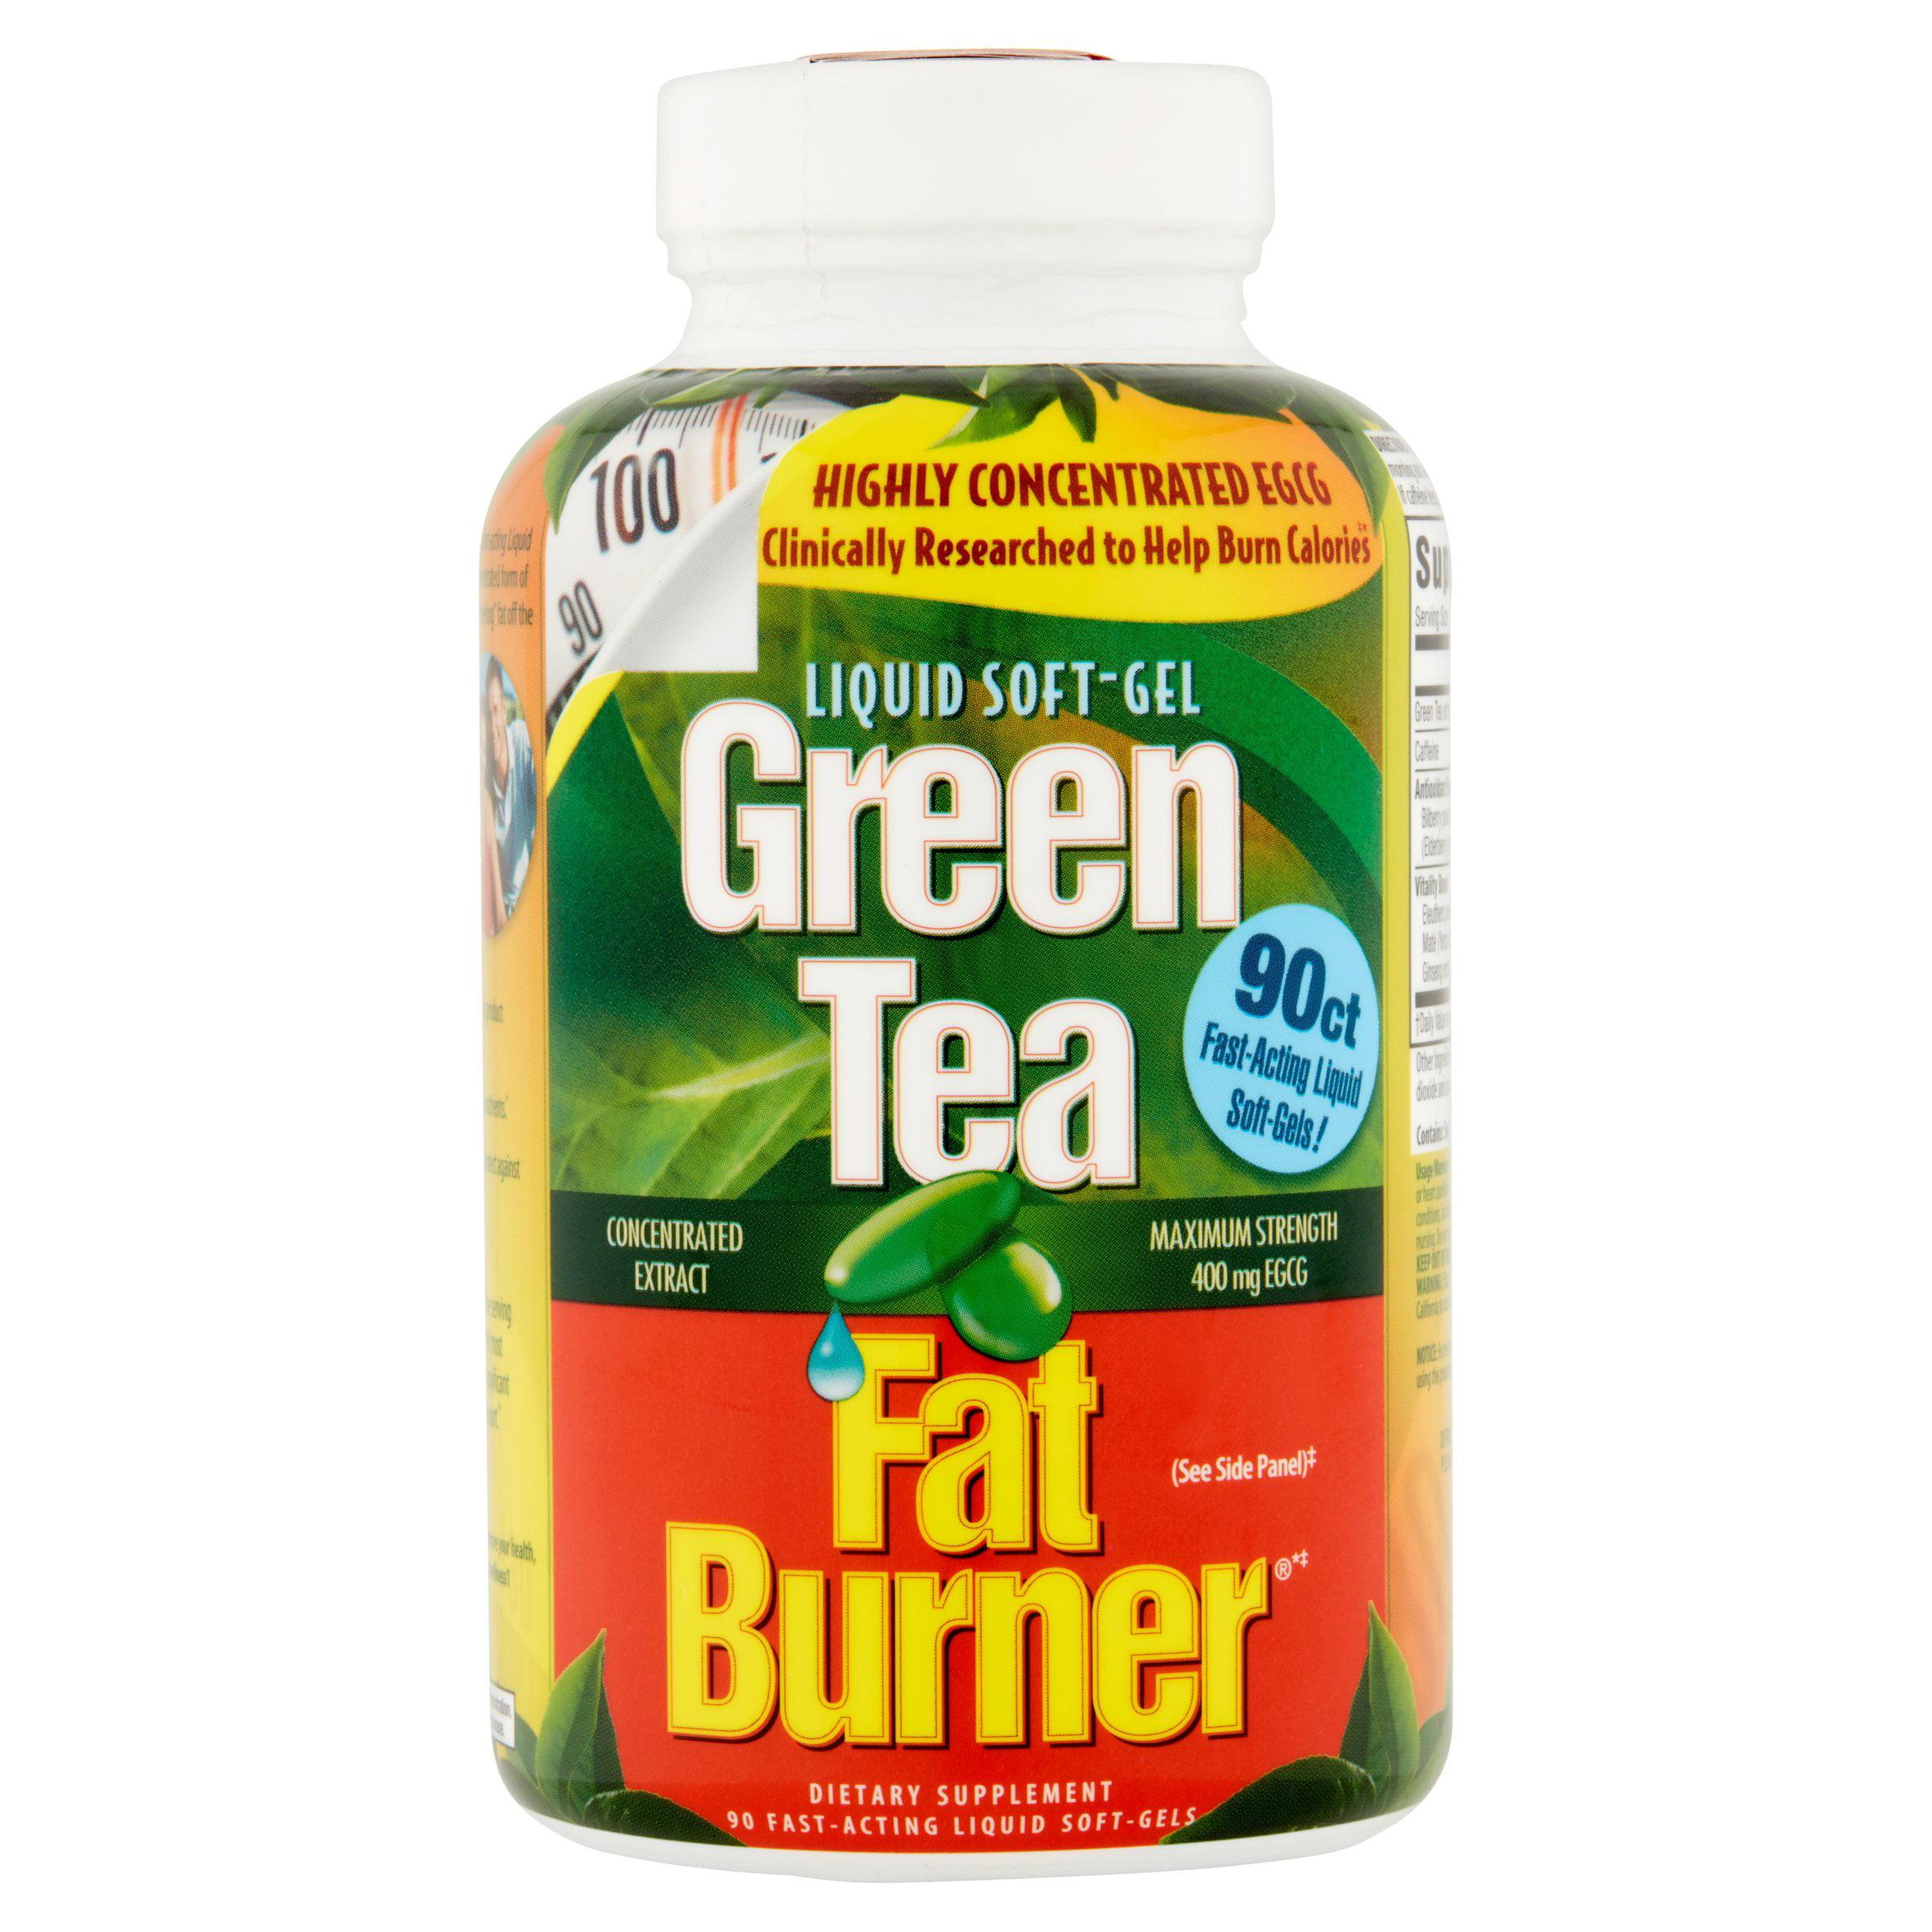 Green Tea Fat Burner: Fat Burner Dietary Supplement Green Tea, 90 ct